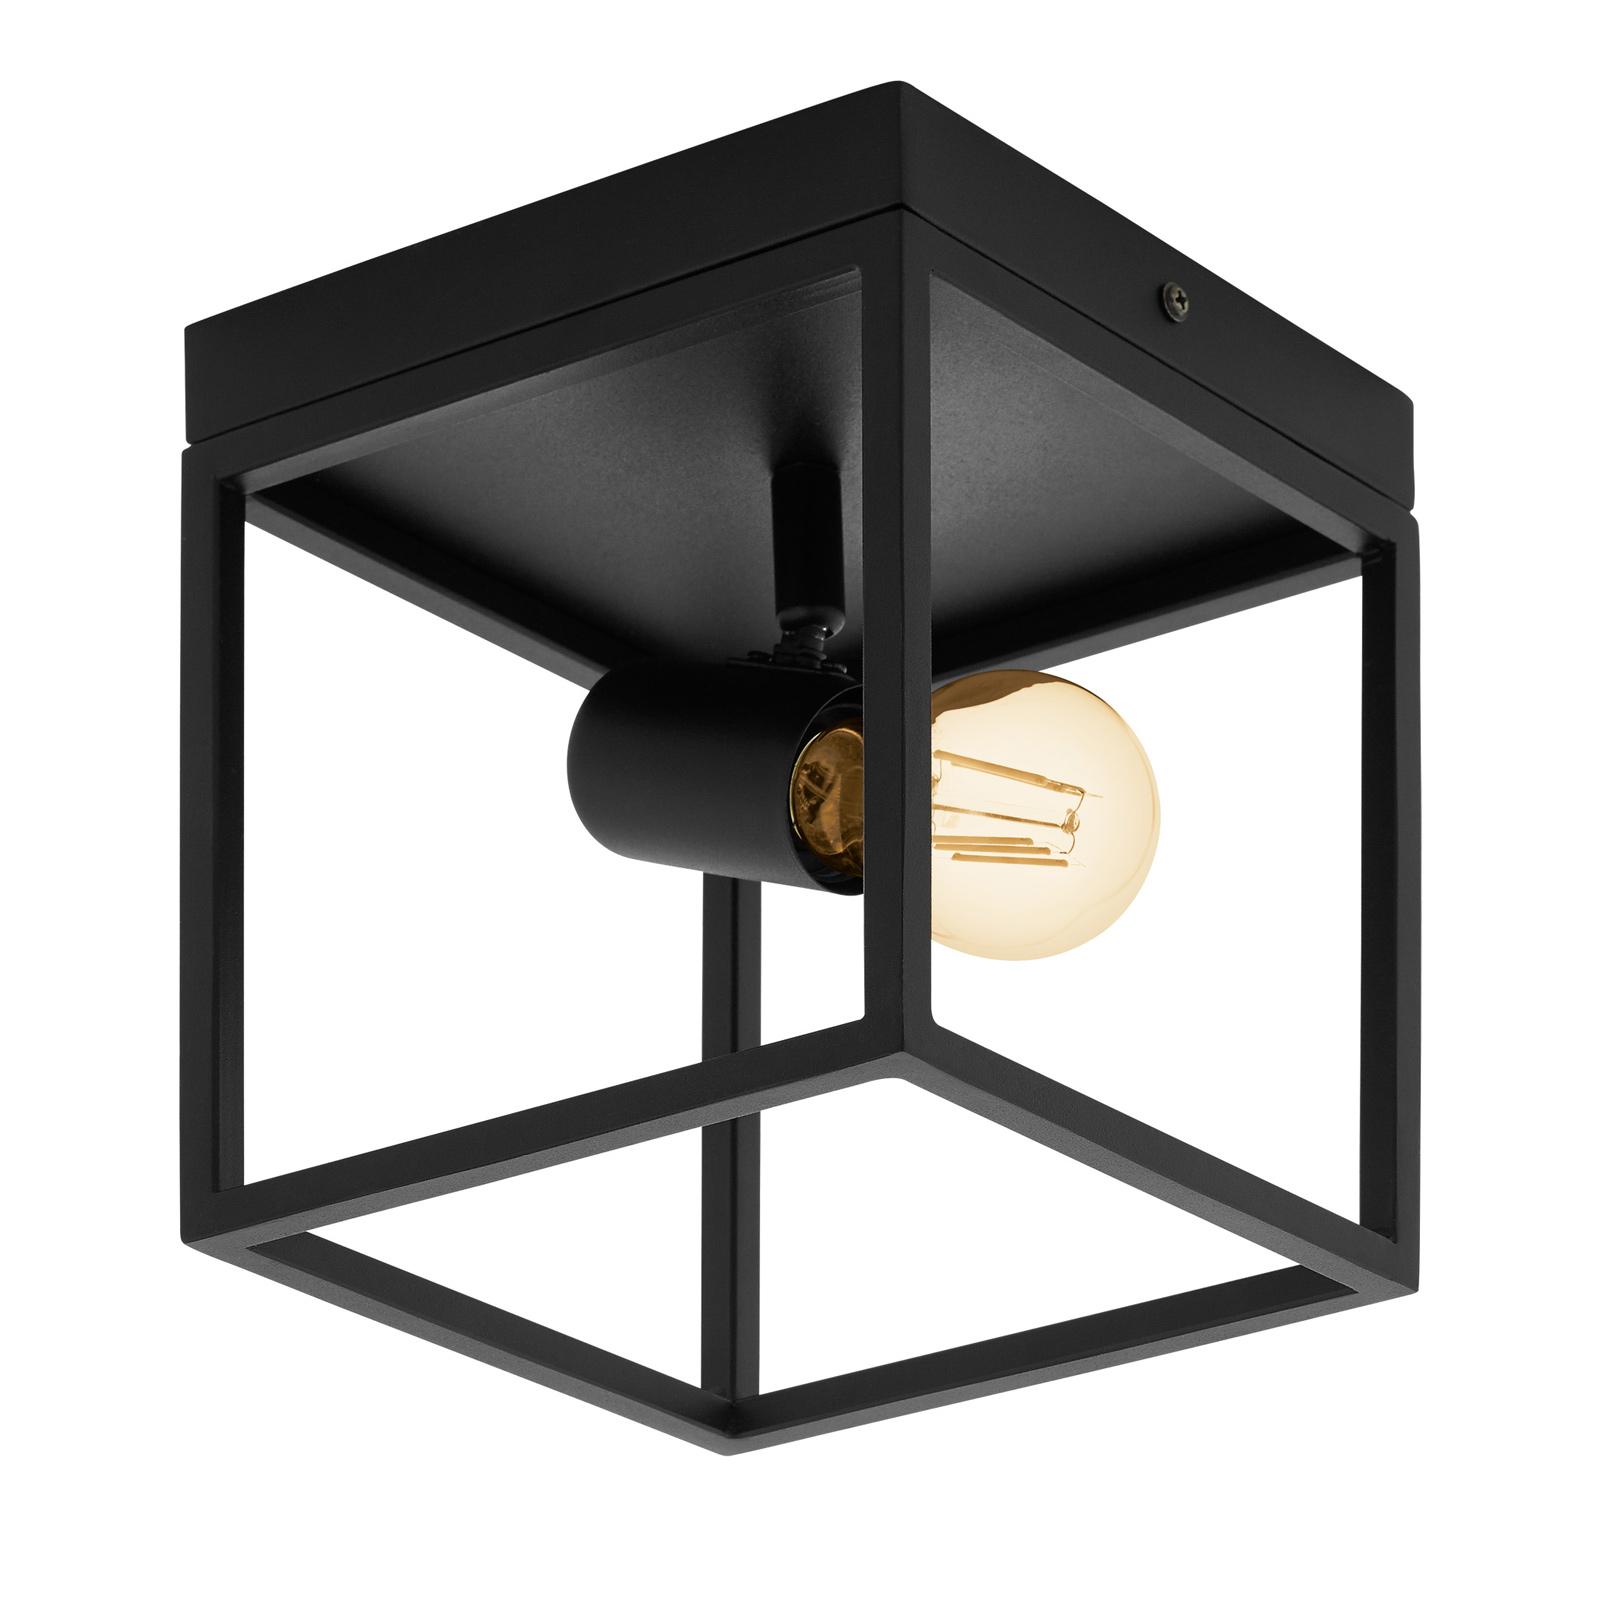 Lampa sufitowa Silentina 1-punktowa, 18x18cm